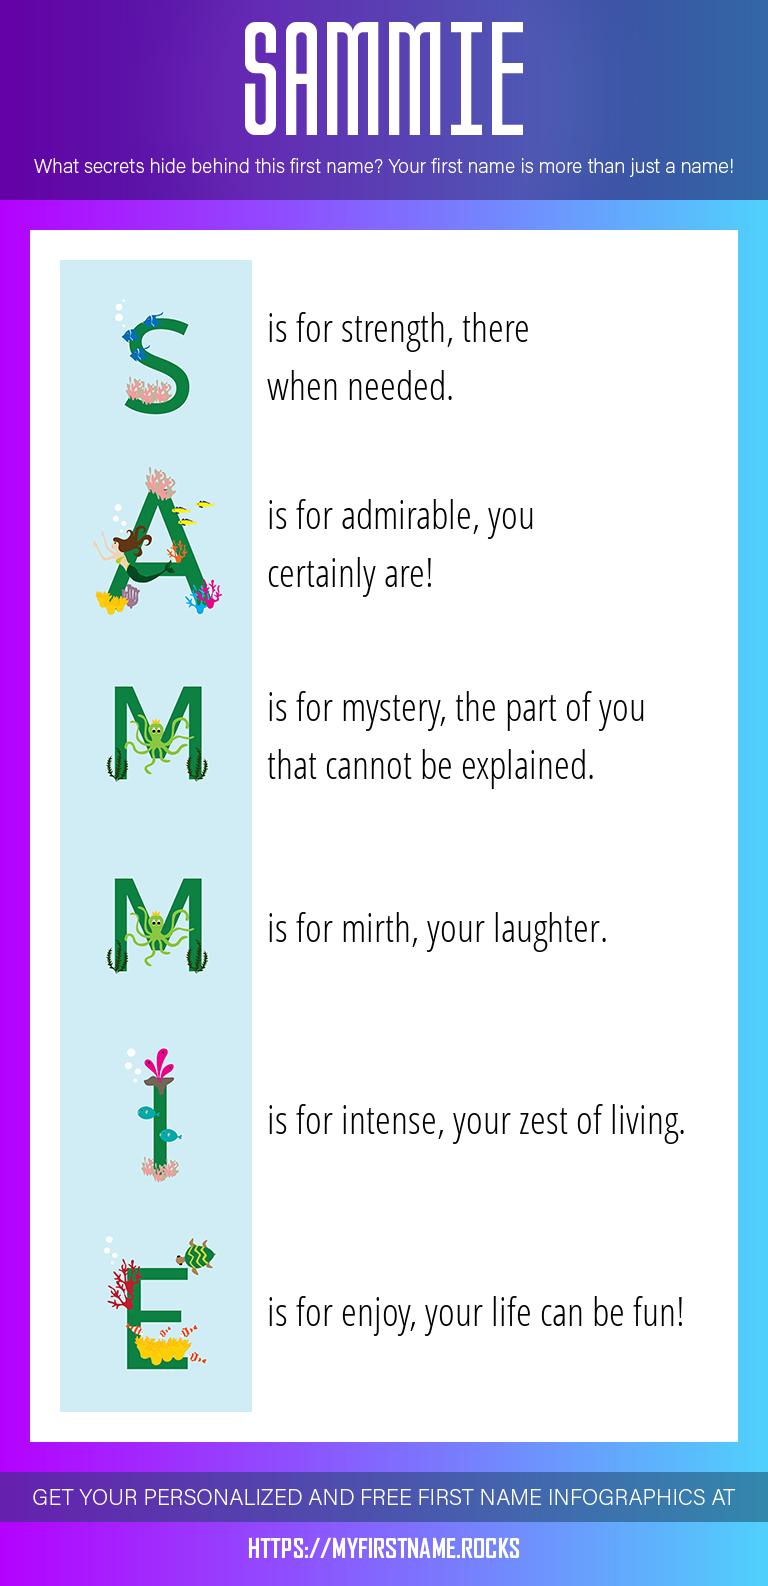 Sammie Infographics